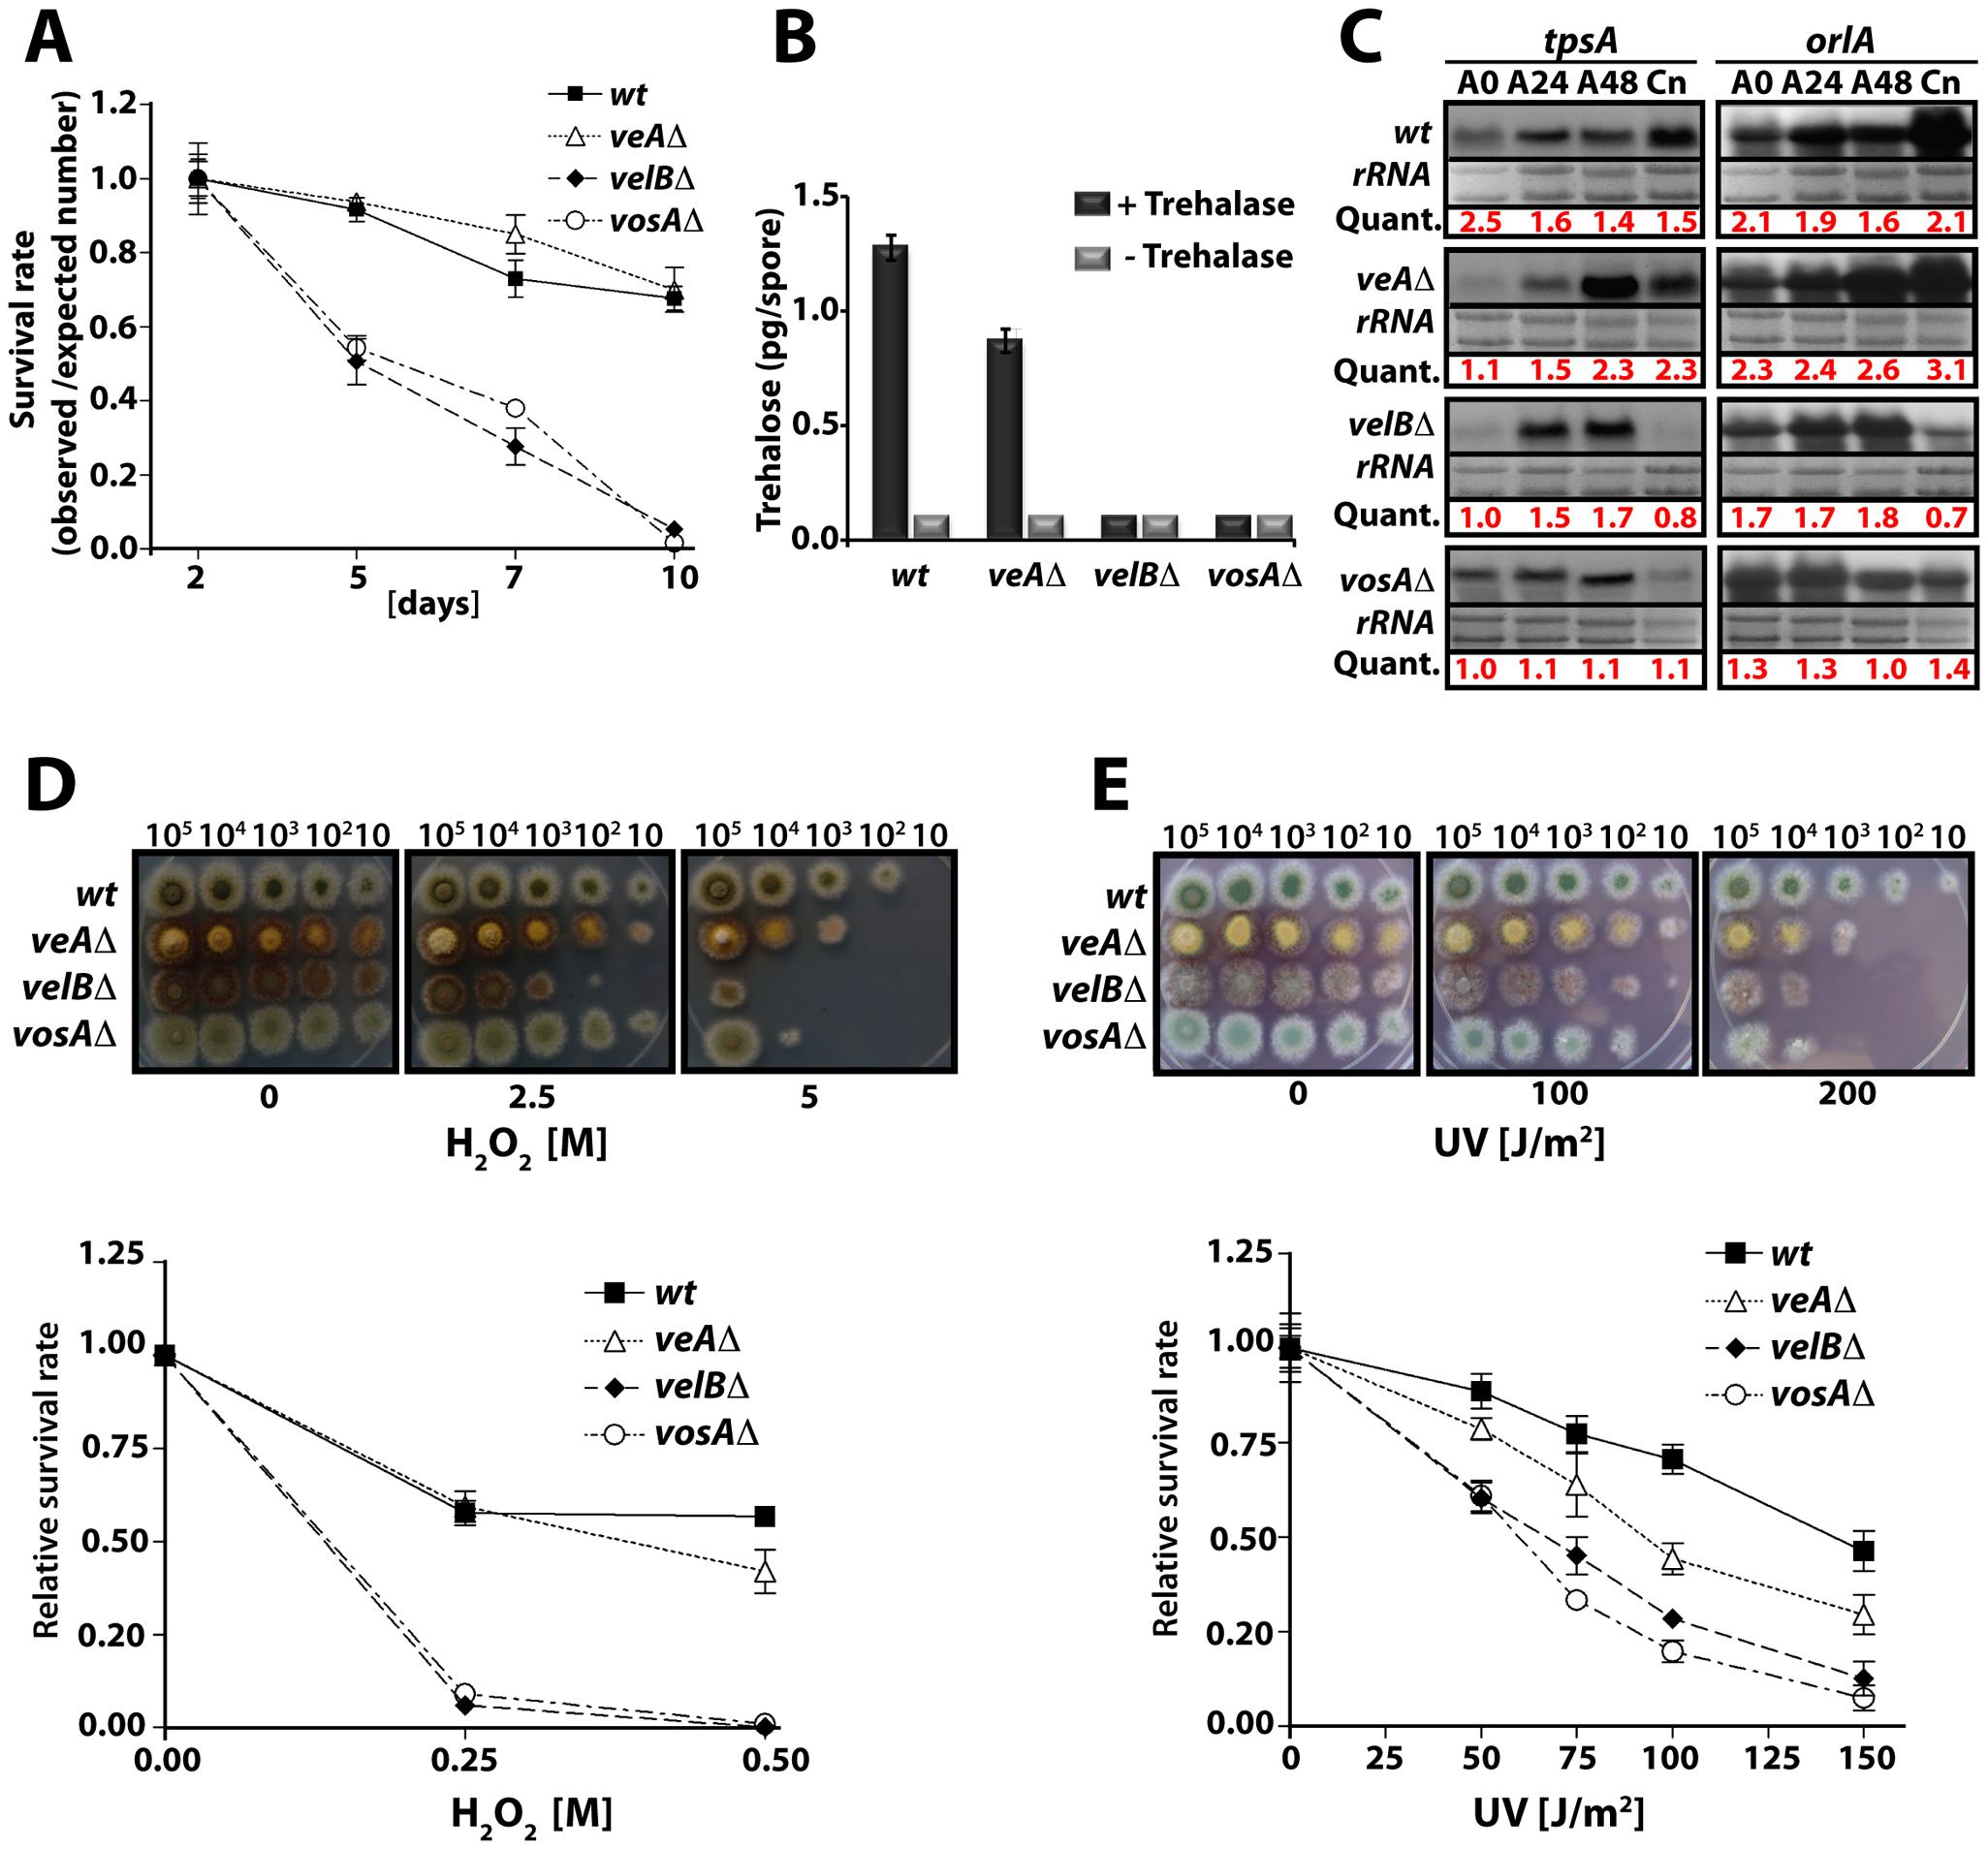 VelB function in spore viability and trehalose biogenesis.